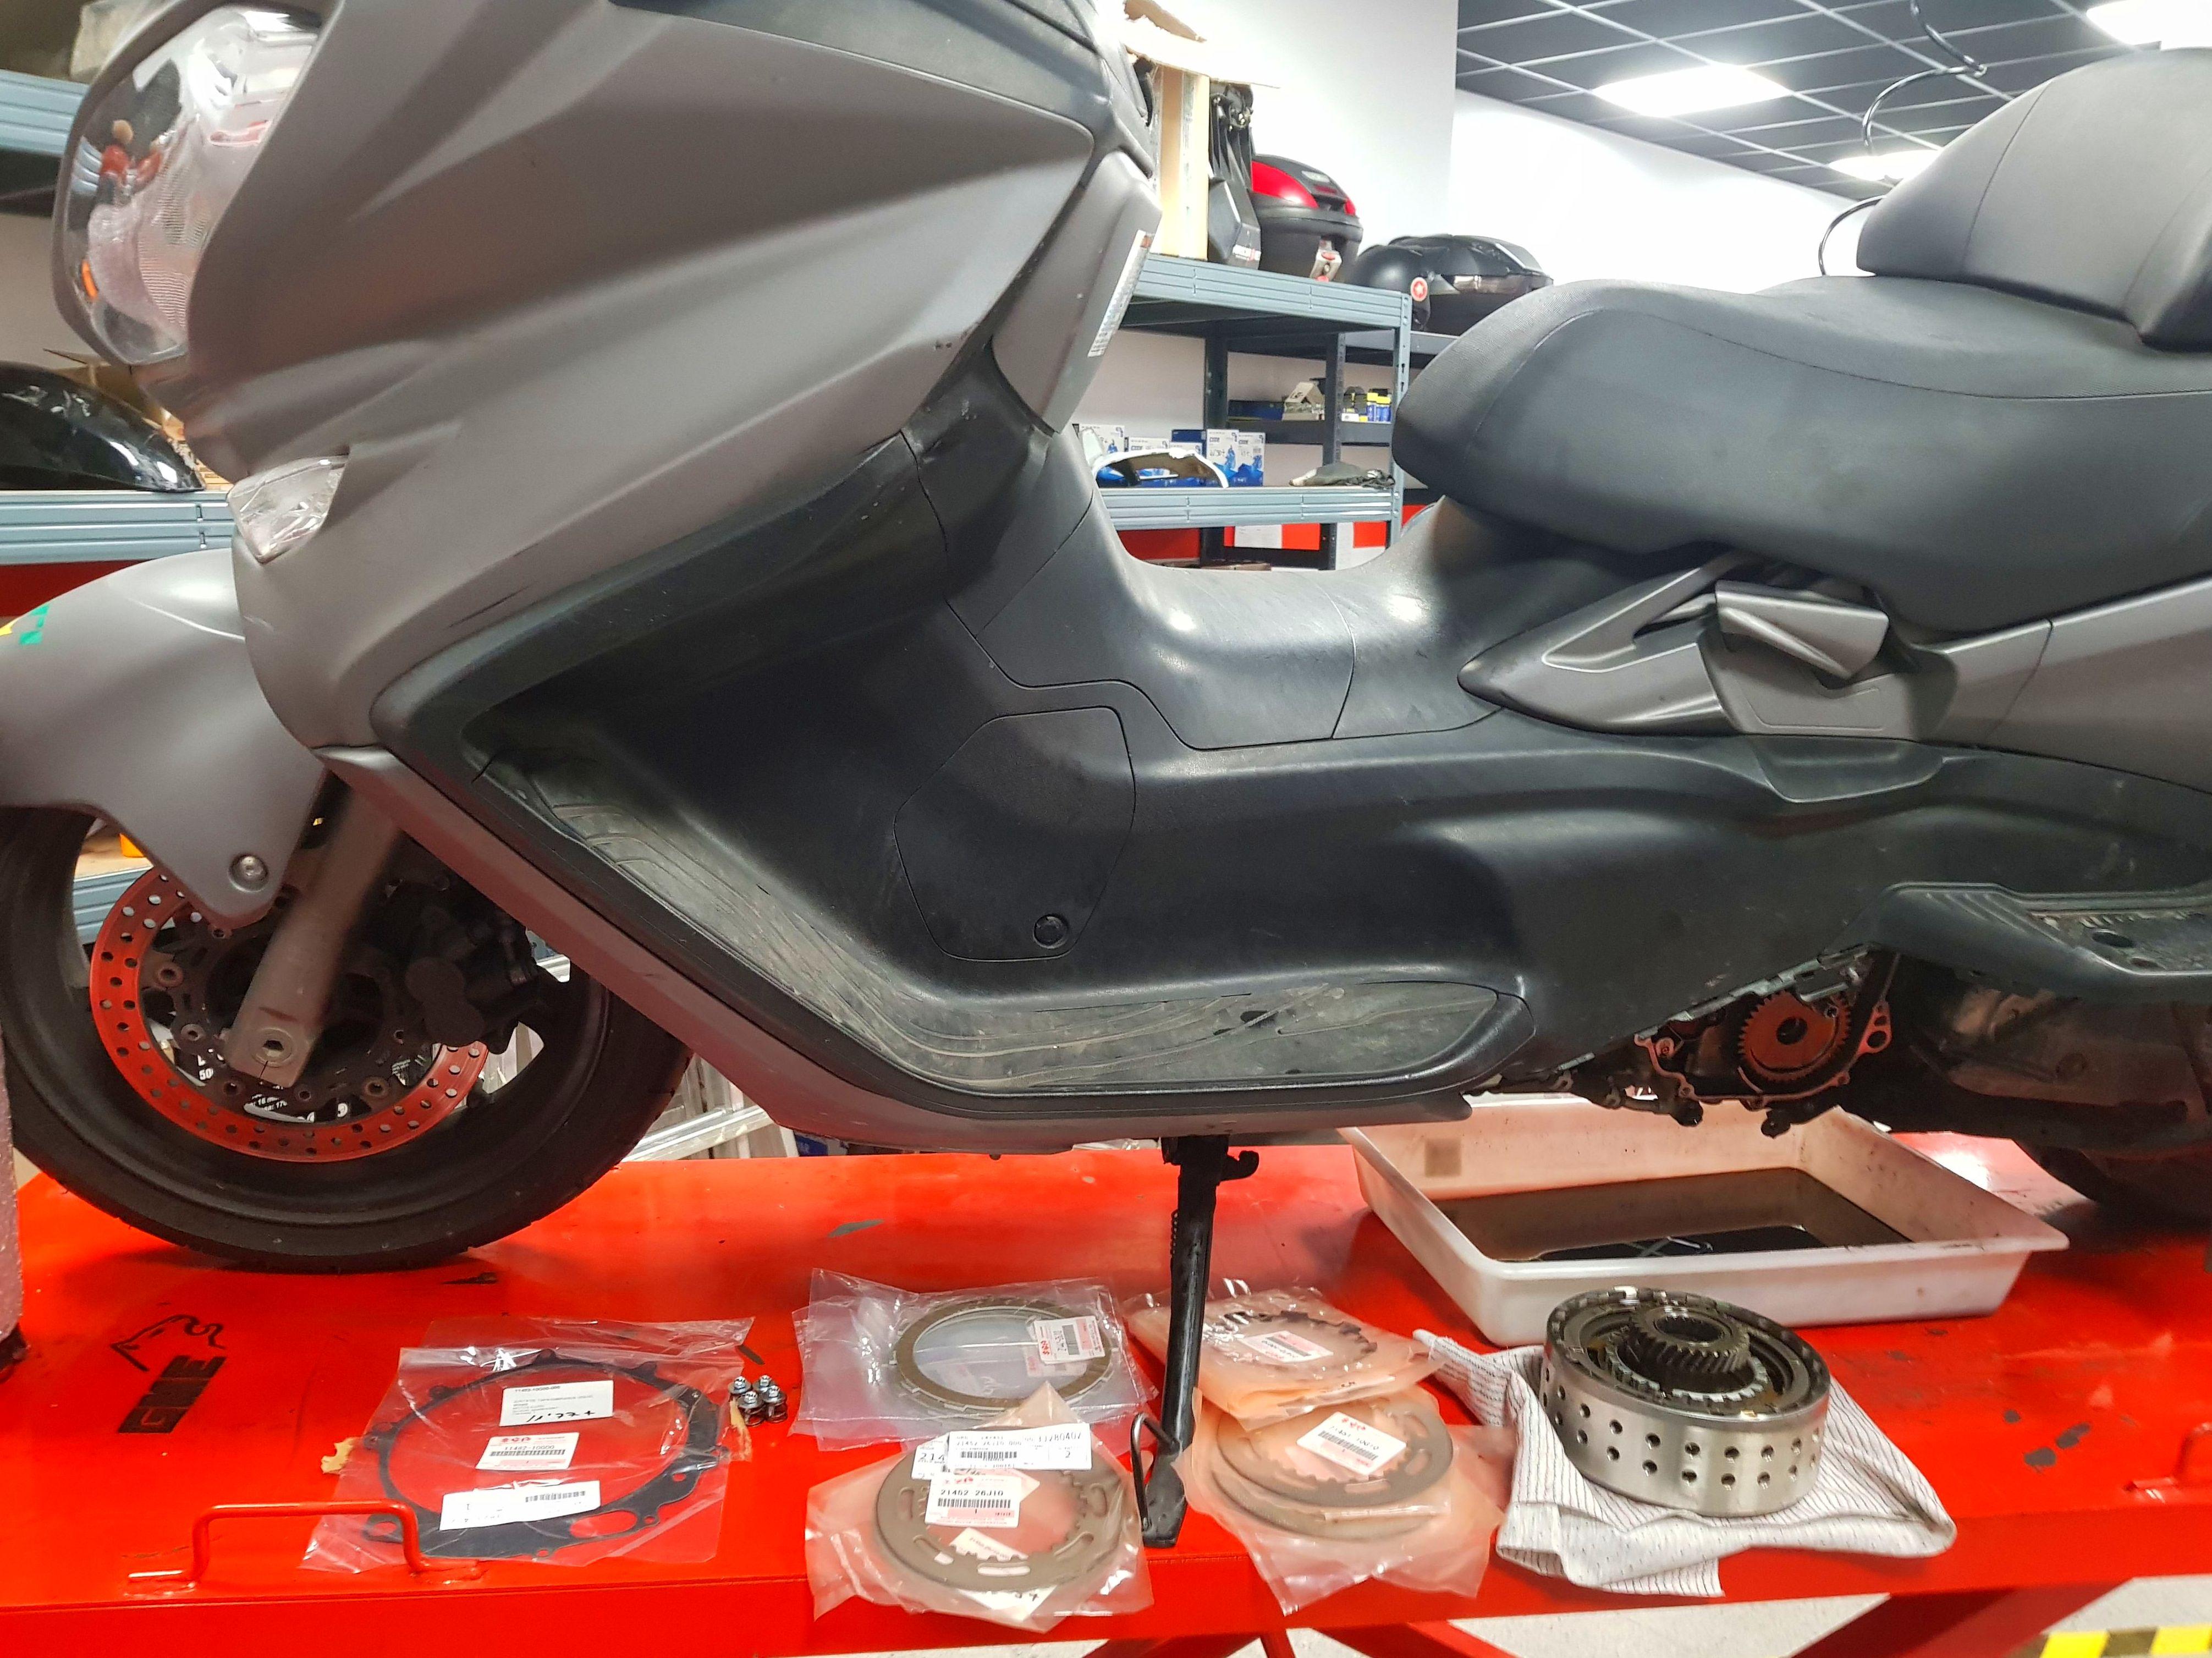 Foto 13 de Taller de motos multimarca en Mataró   Motos Iluro